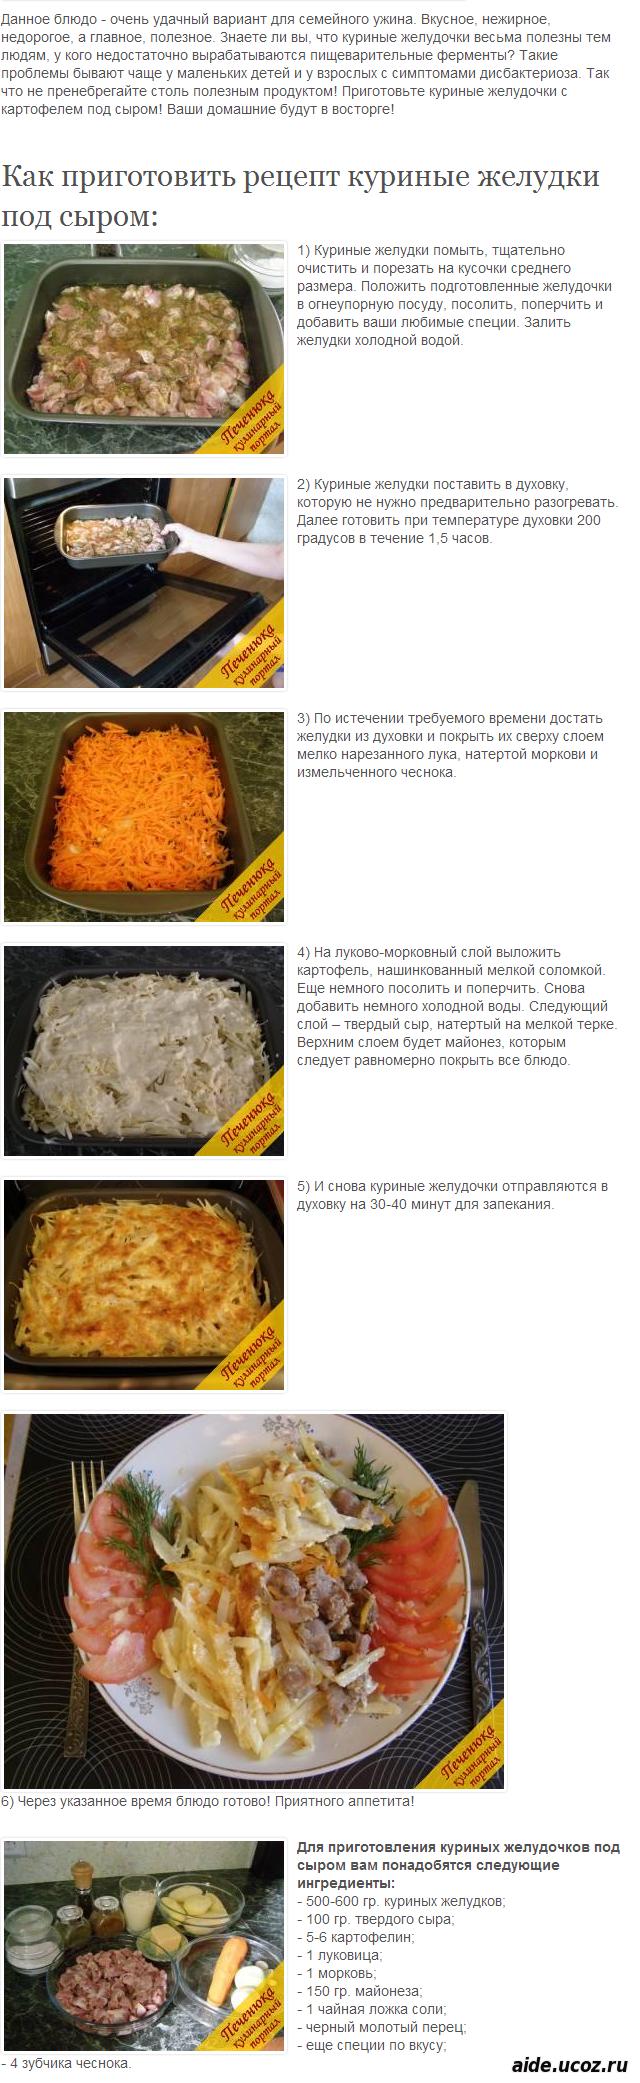 Желудки куриные пошаговый рецепт